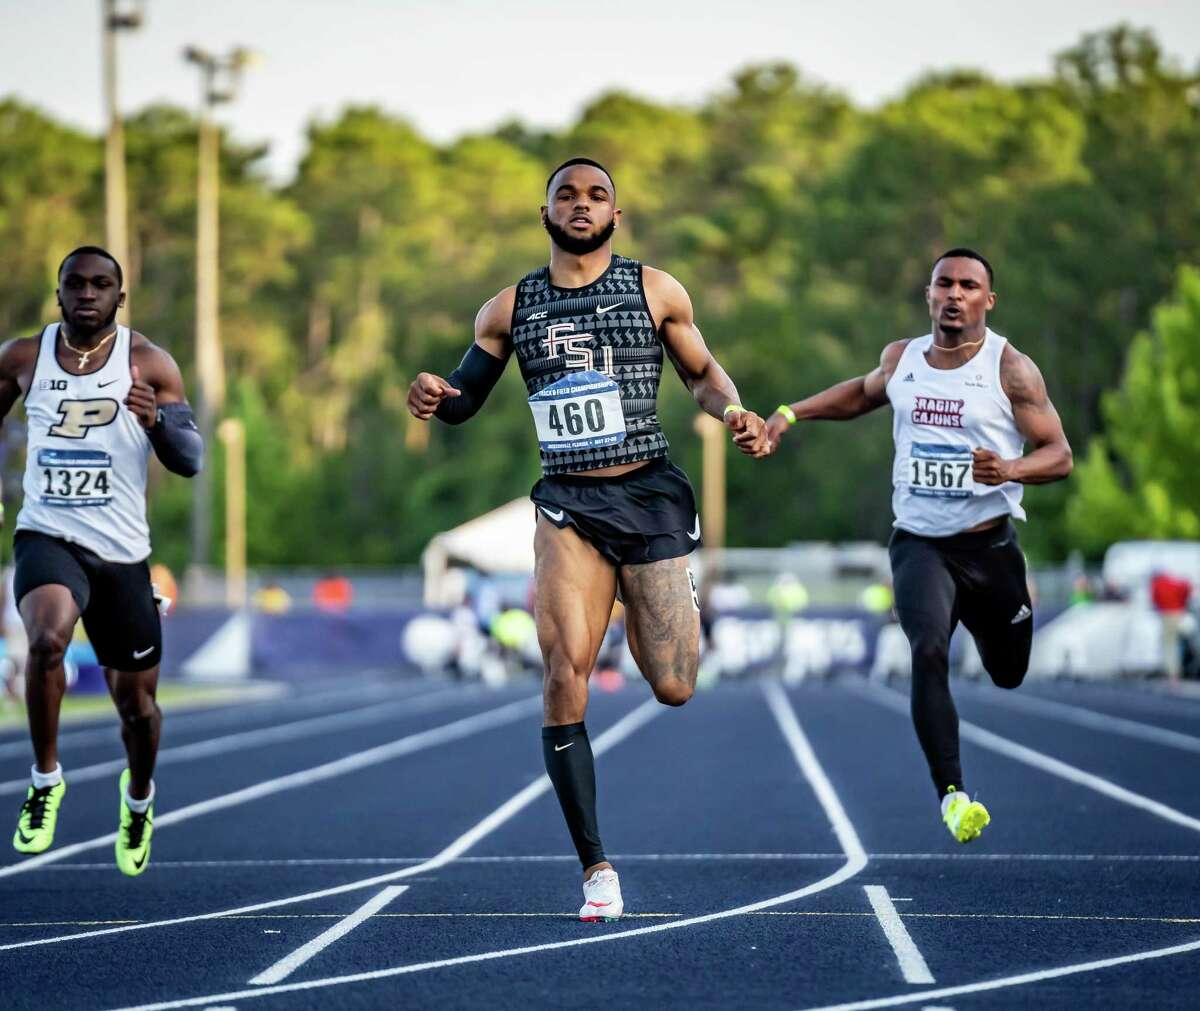 Florida State sprinter and Conroe High School alum Jo'Vaughn Martin runs during the NCAA East Preliminaries in Jacksonville.